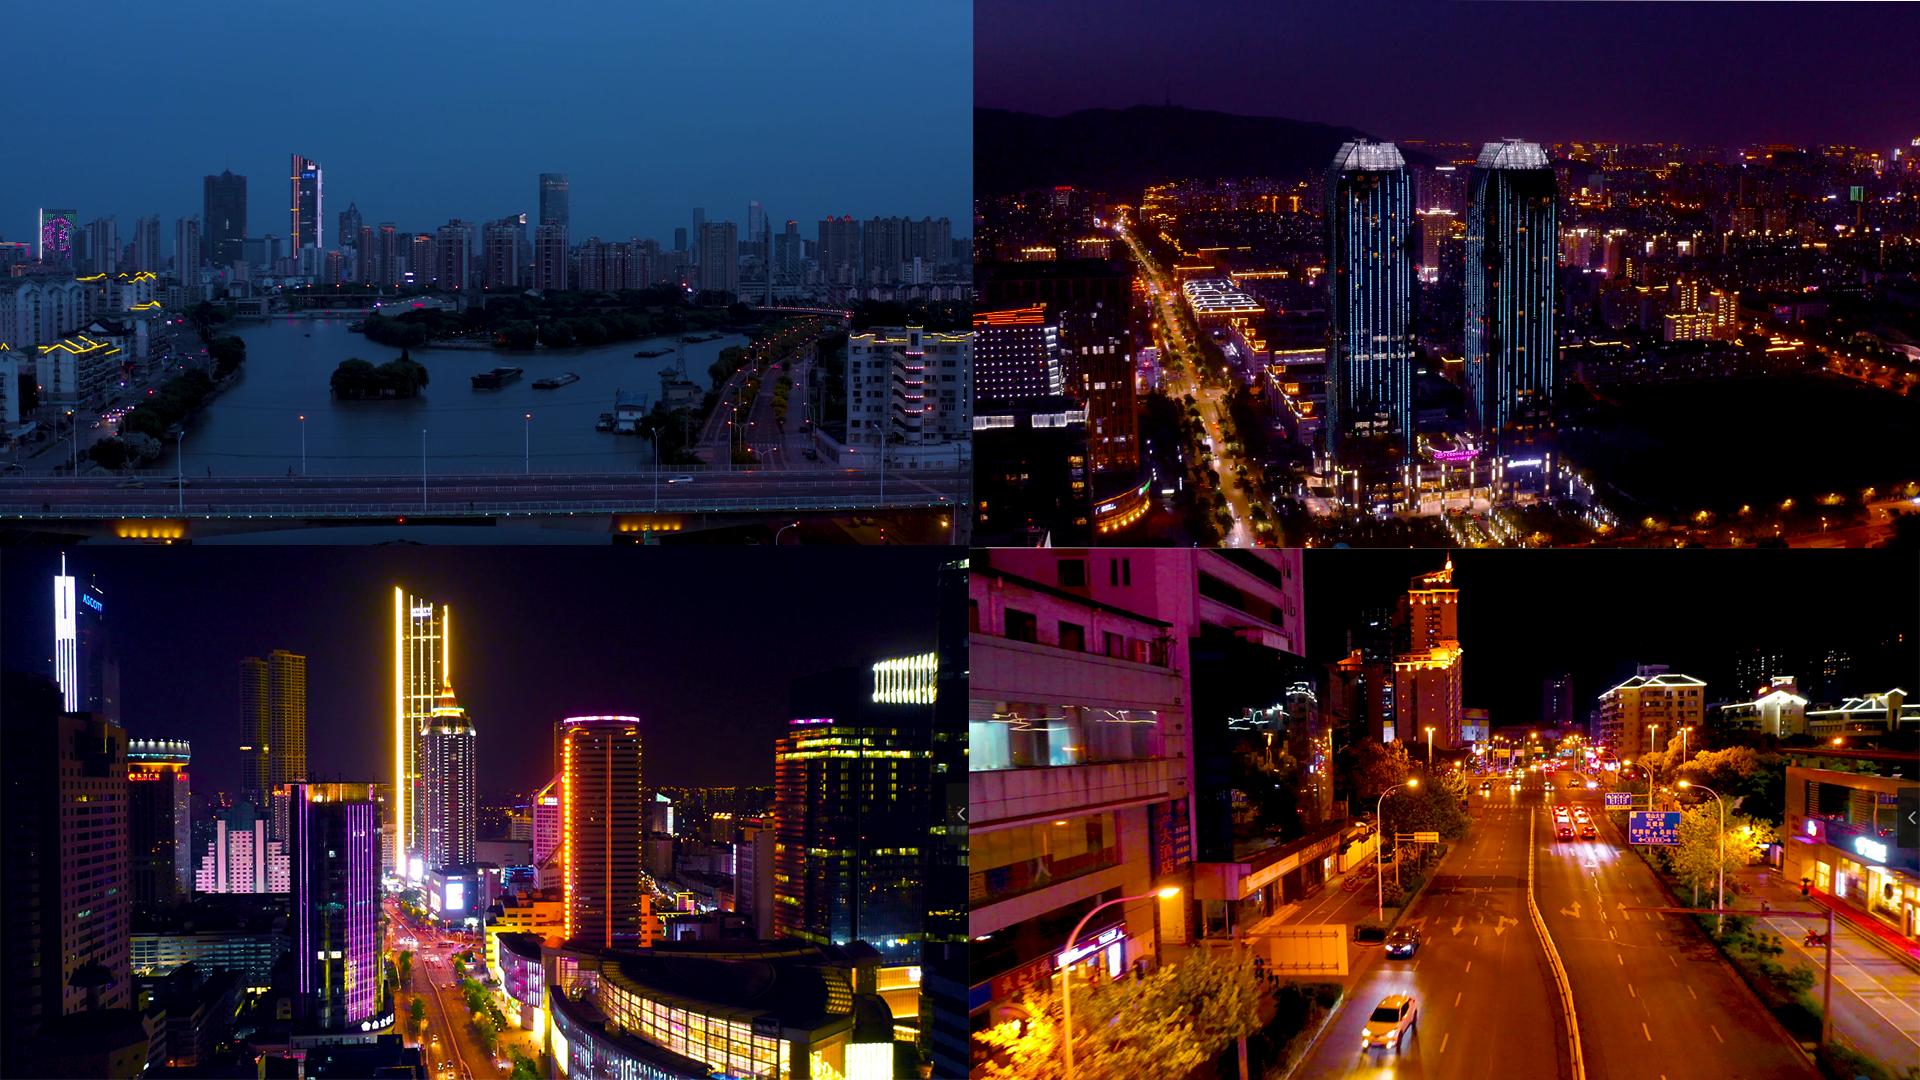 4k无锡城市夜景航拍